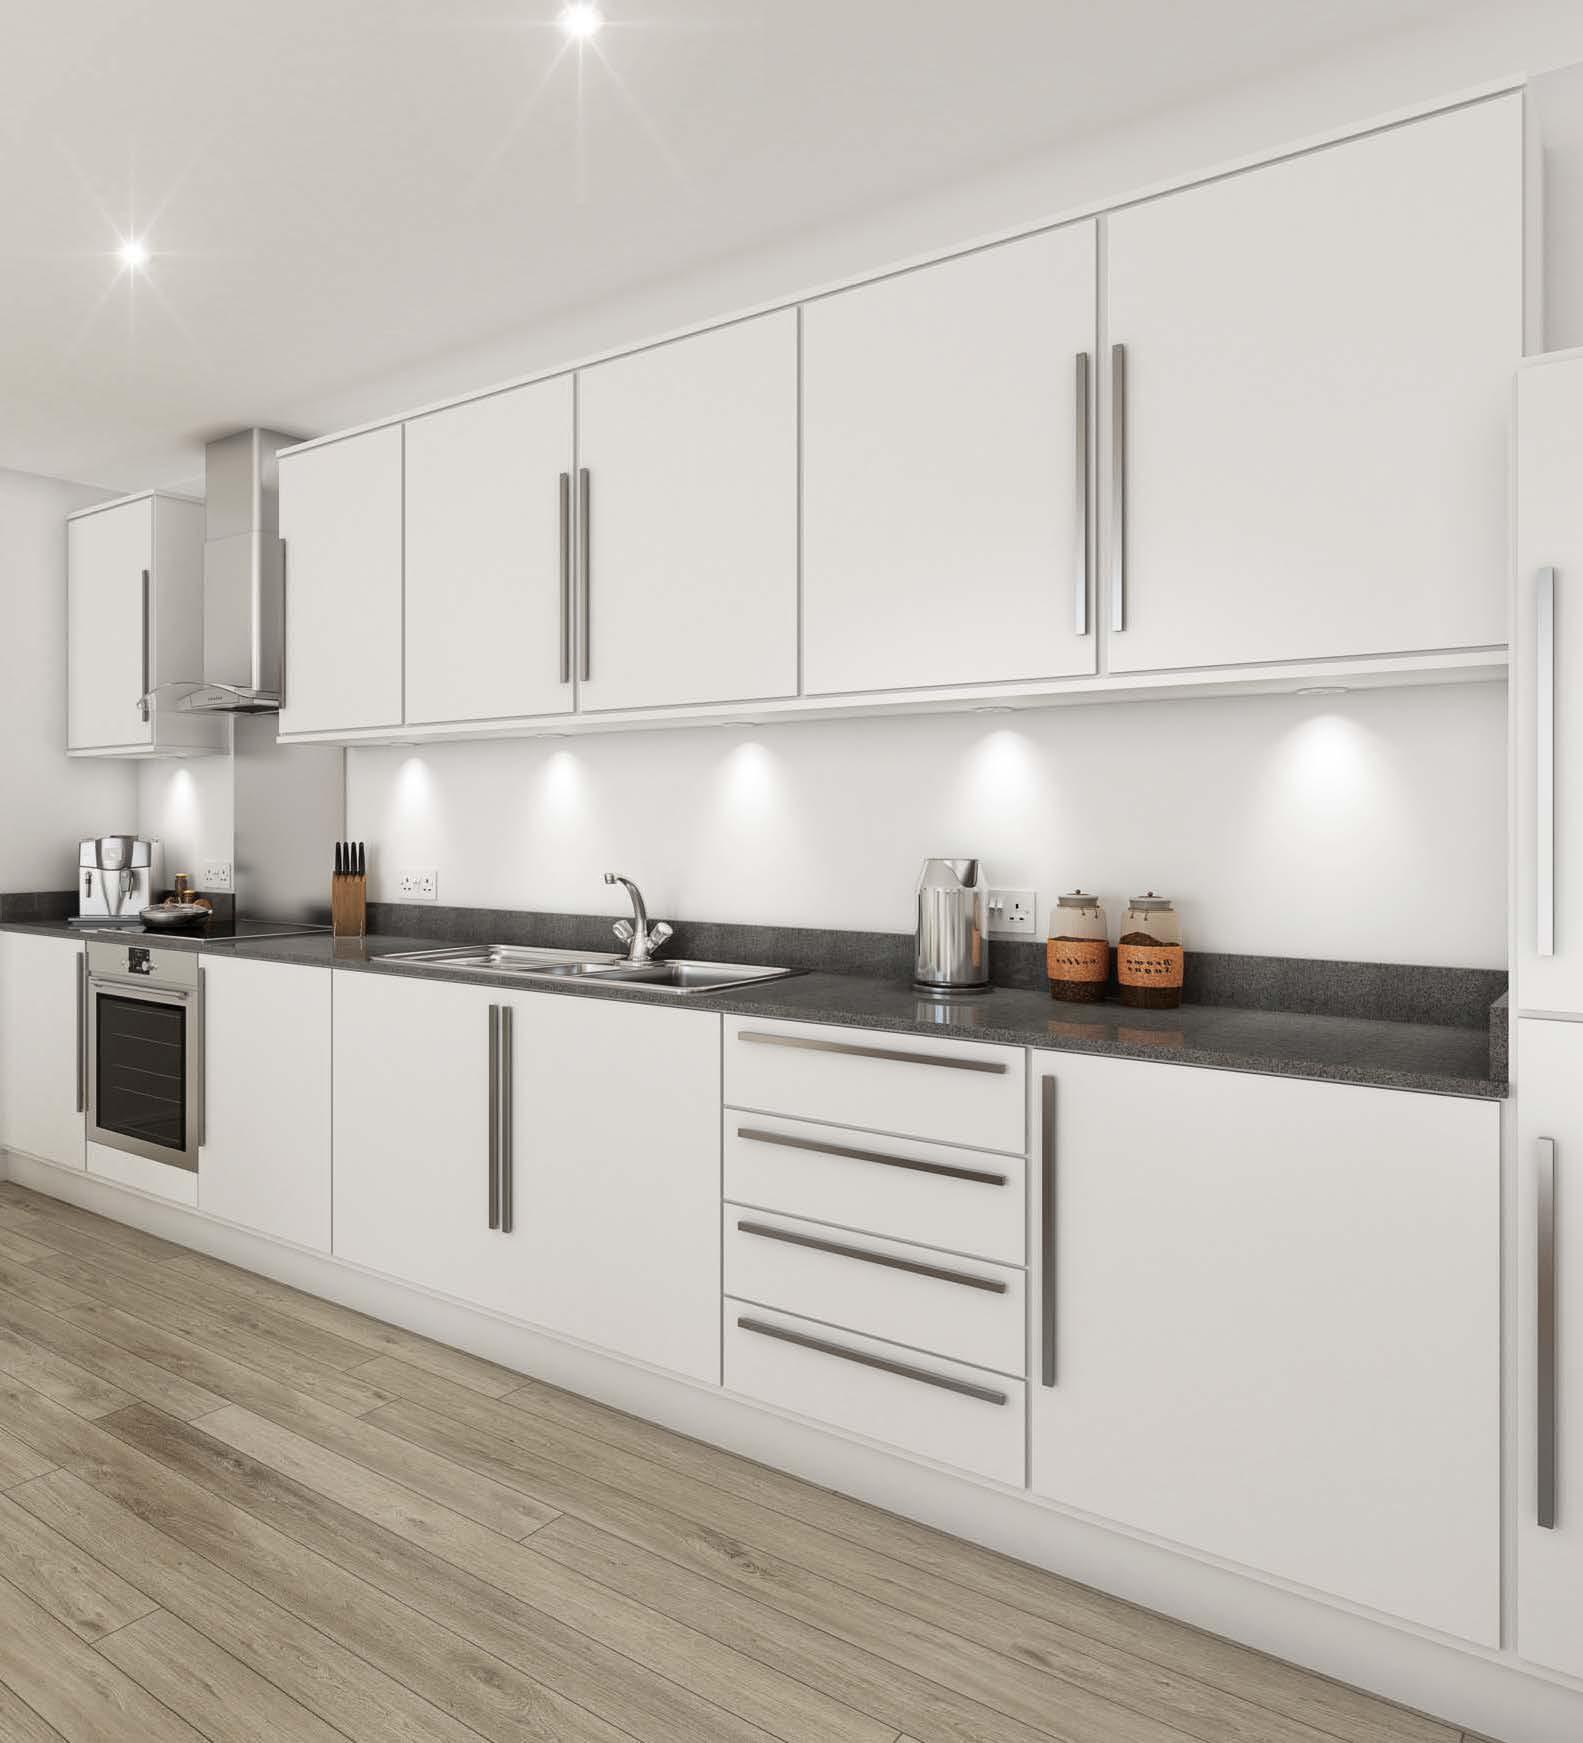 http://investinplc.com/wp-content/uploads/2017/01/Vista-Ashford-Brochure_single-kitchen.jpg